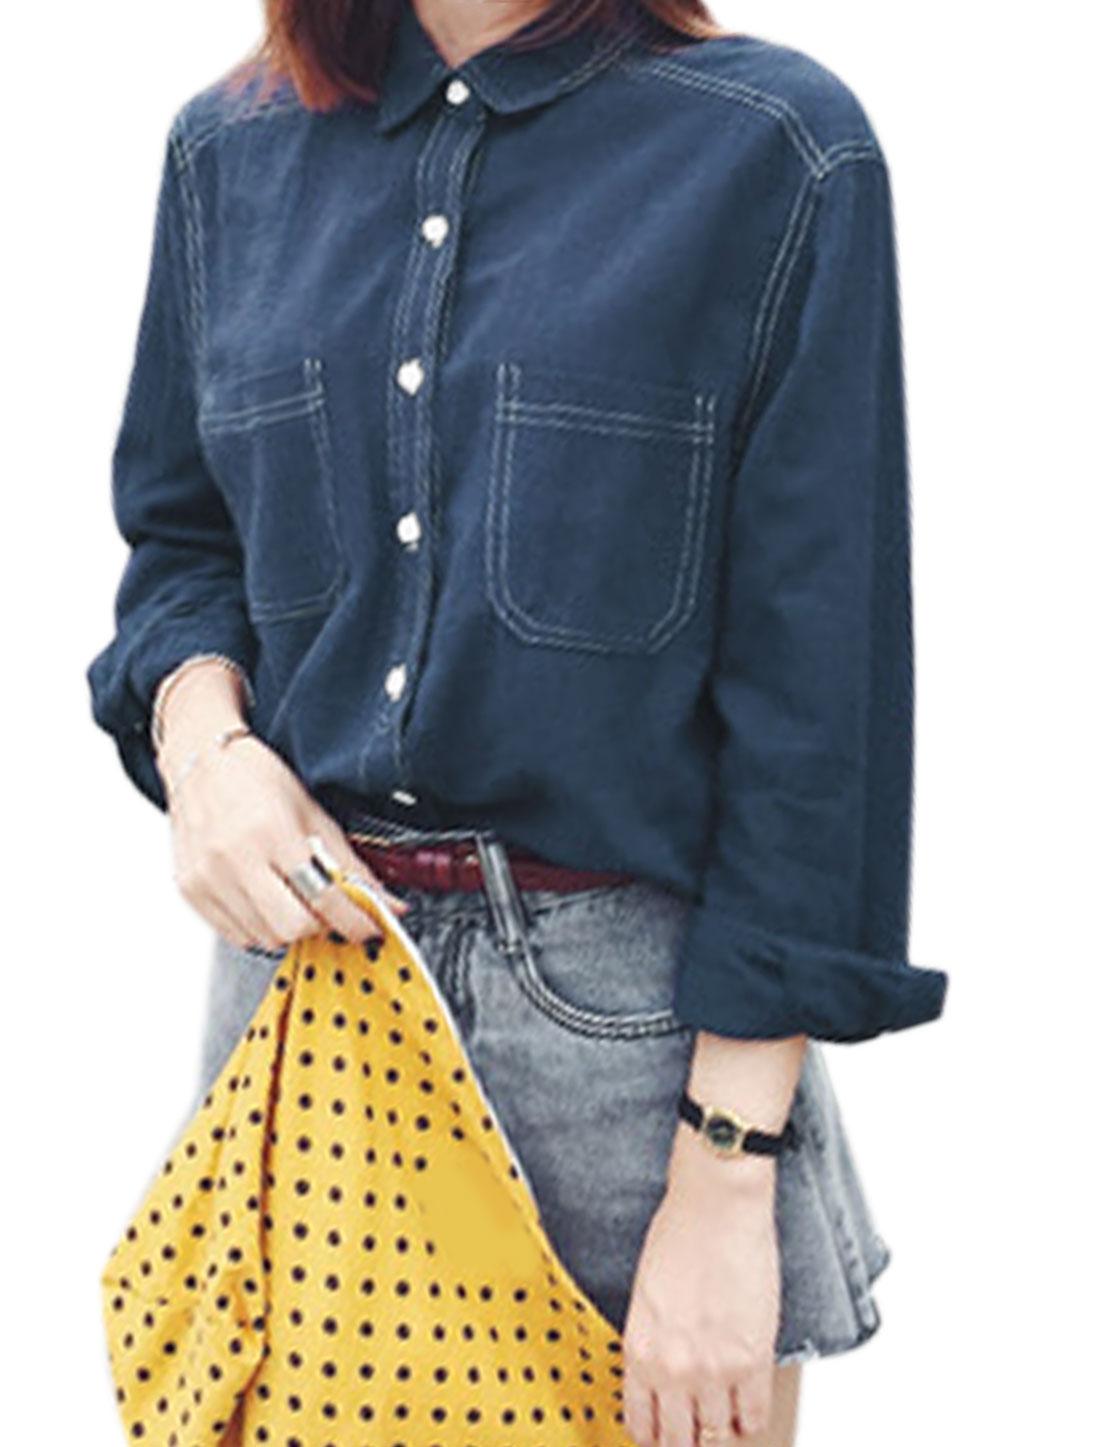 Woman Long Sleeves Button Closure Casual Shirt Dark Blue XS